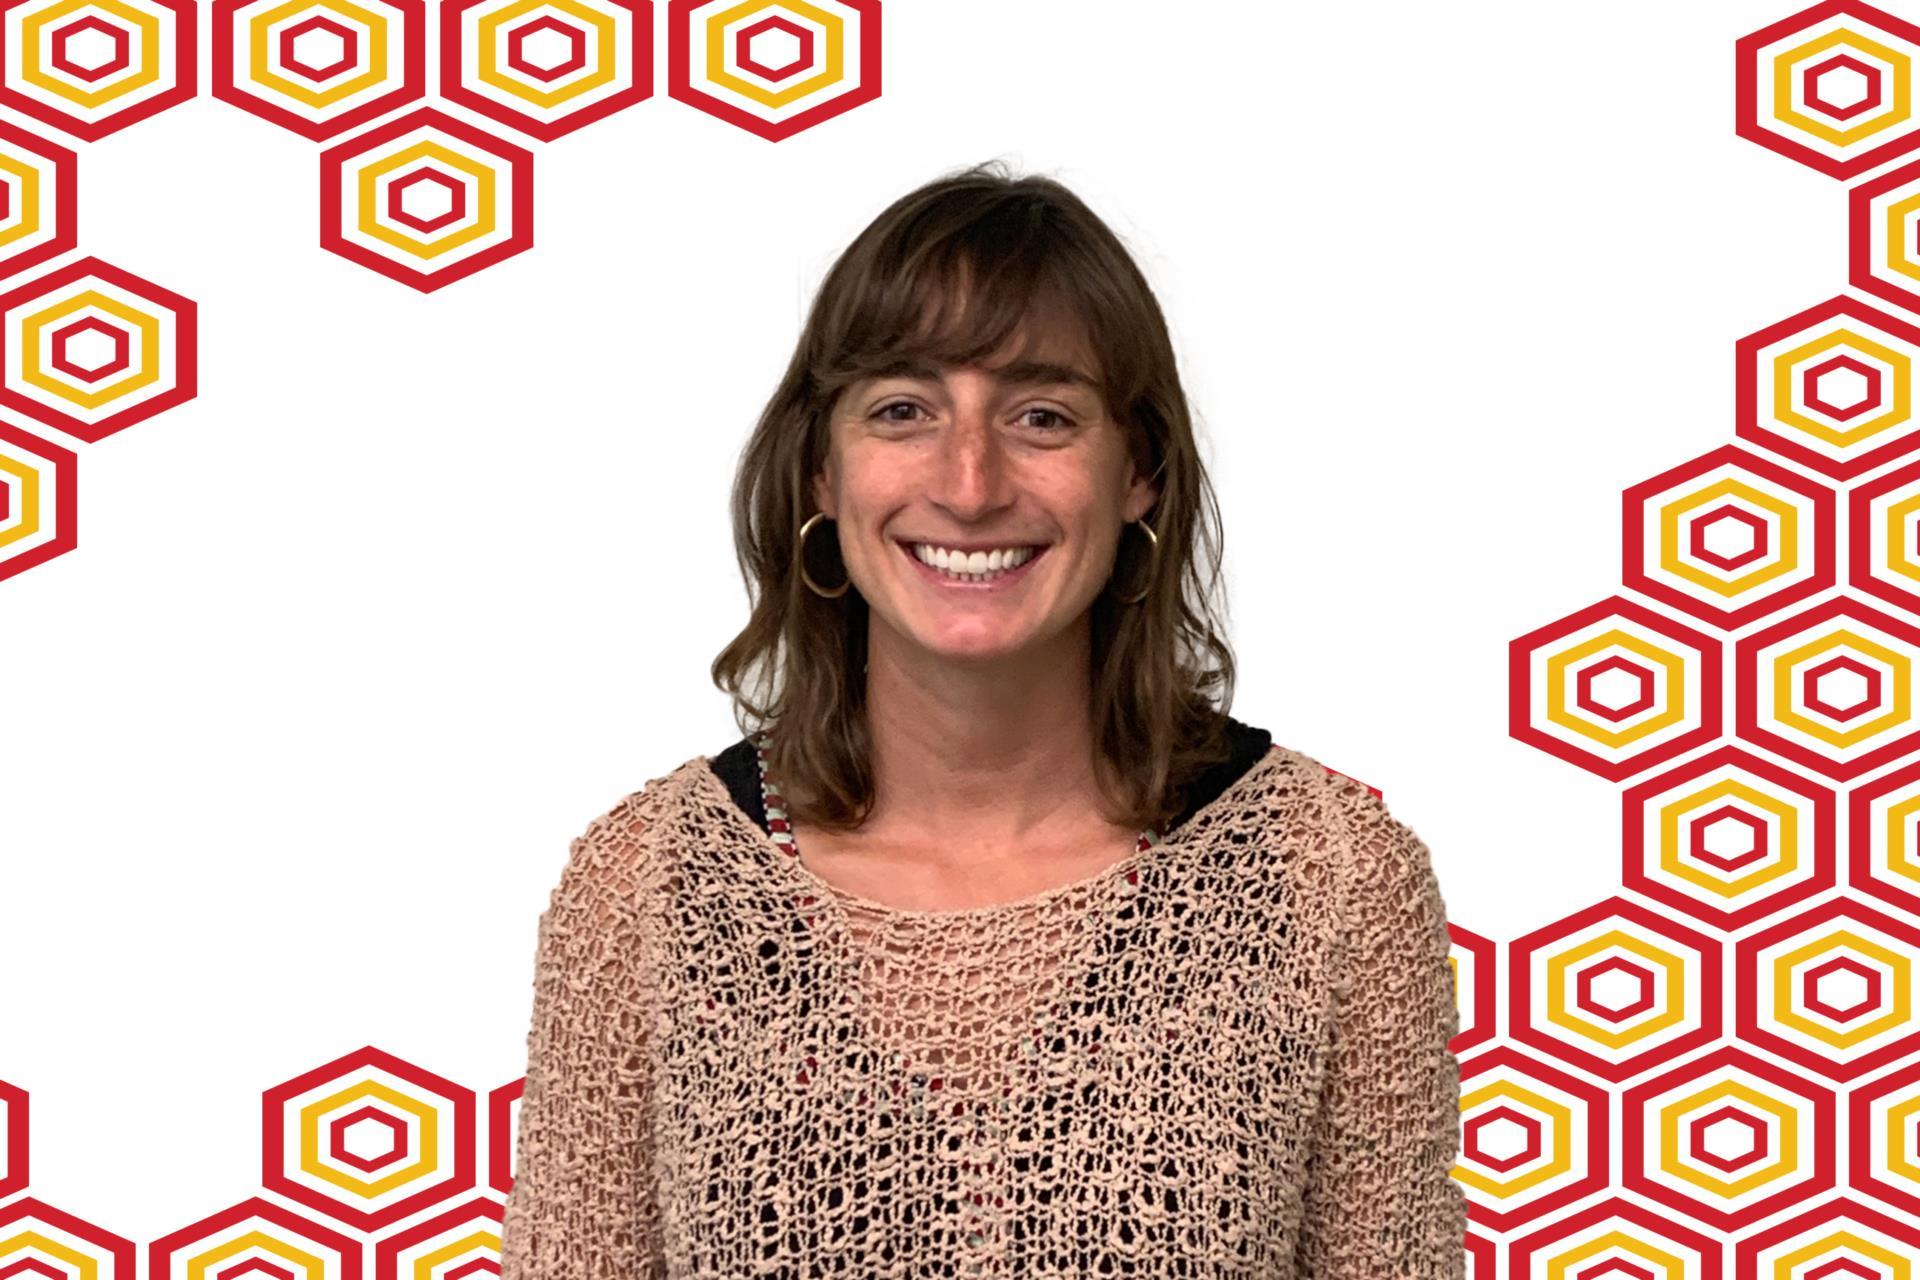 Leah Barboza